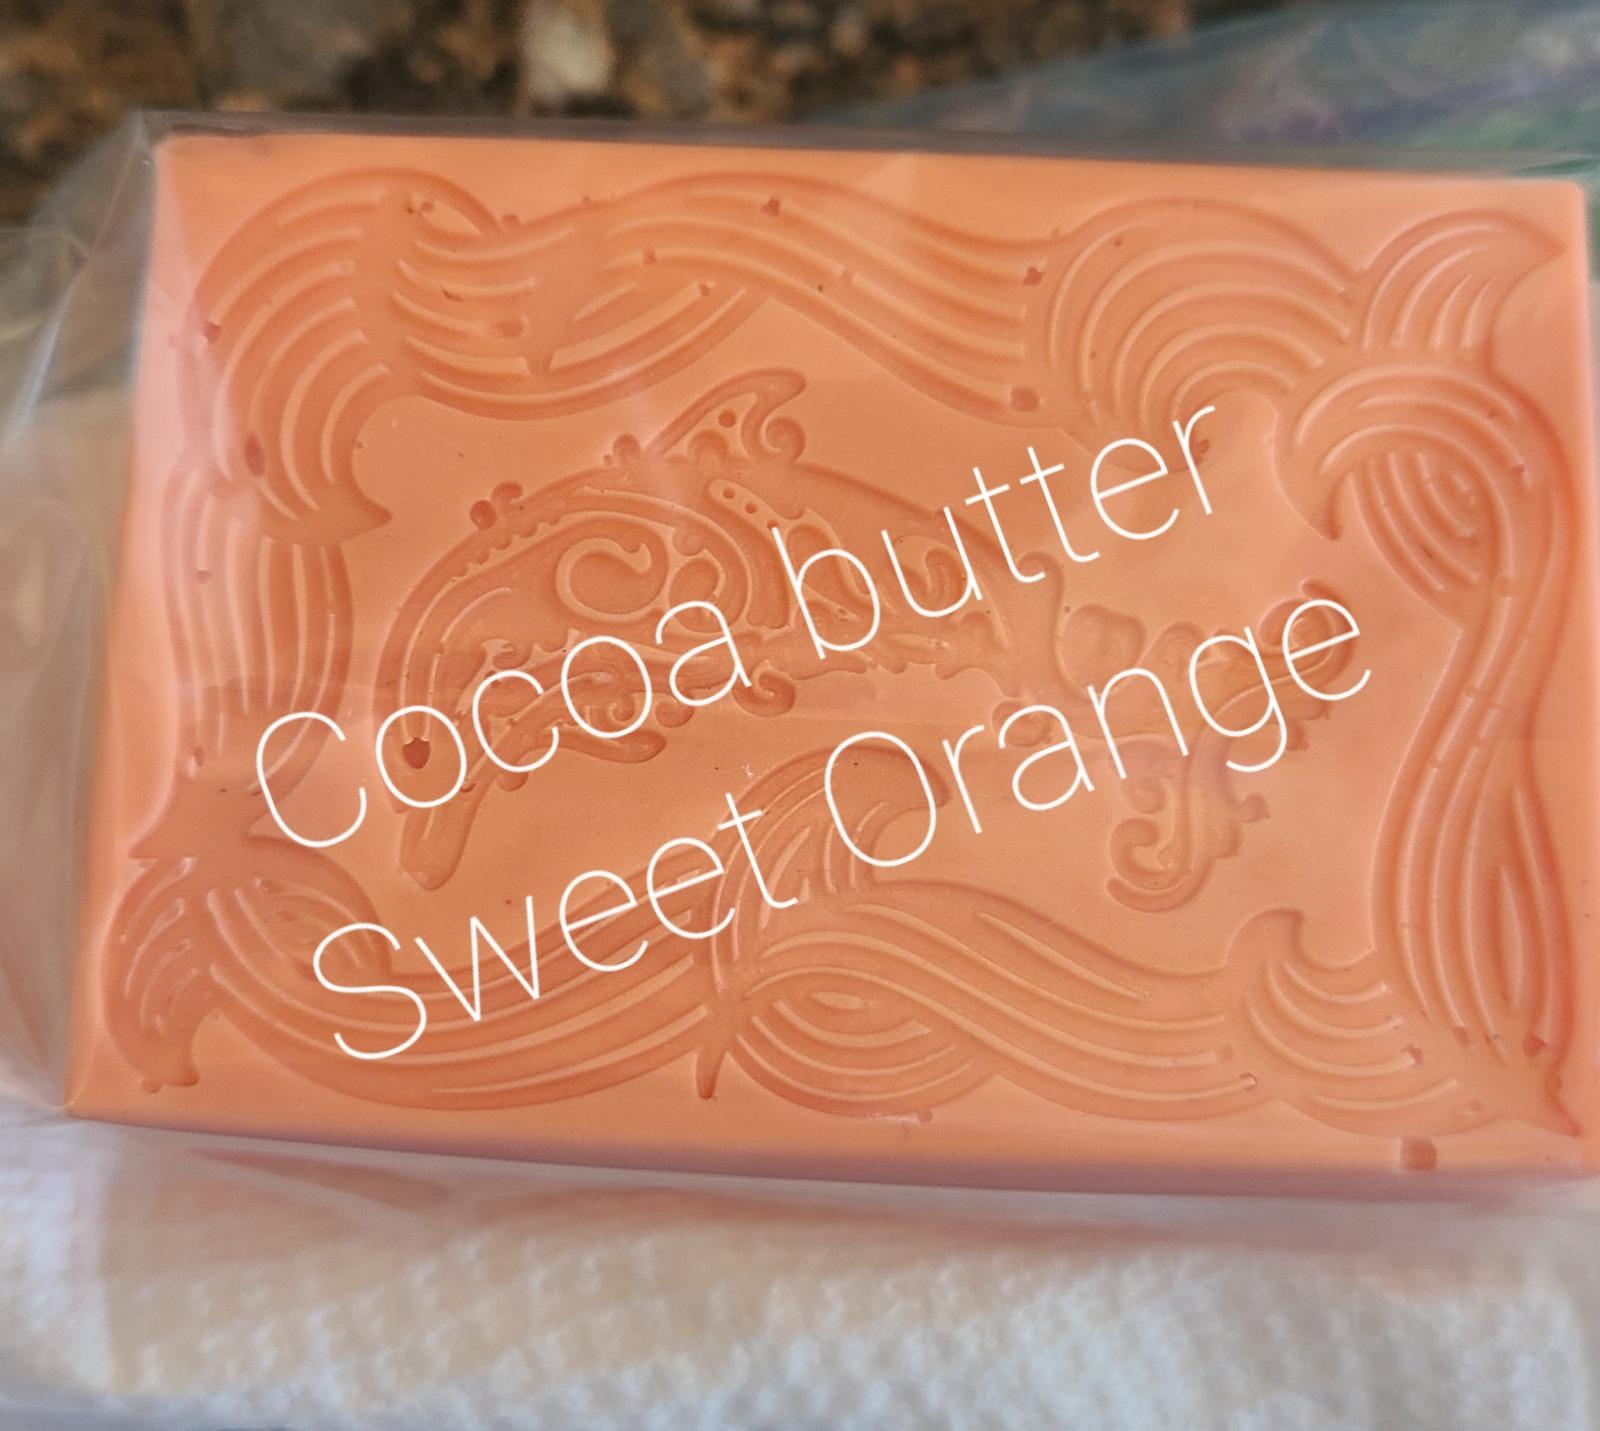 Cocoa Butter Handmade Soap